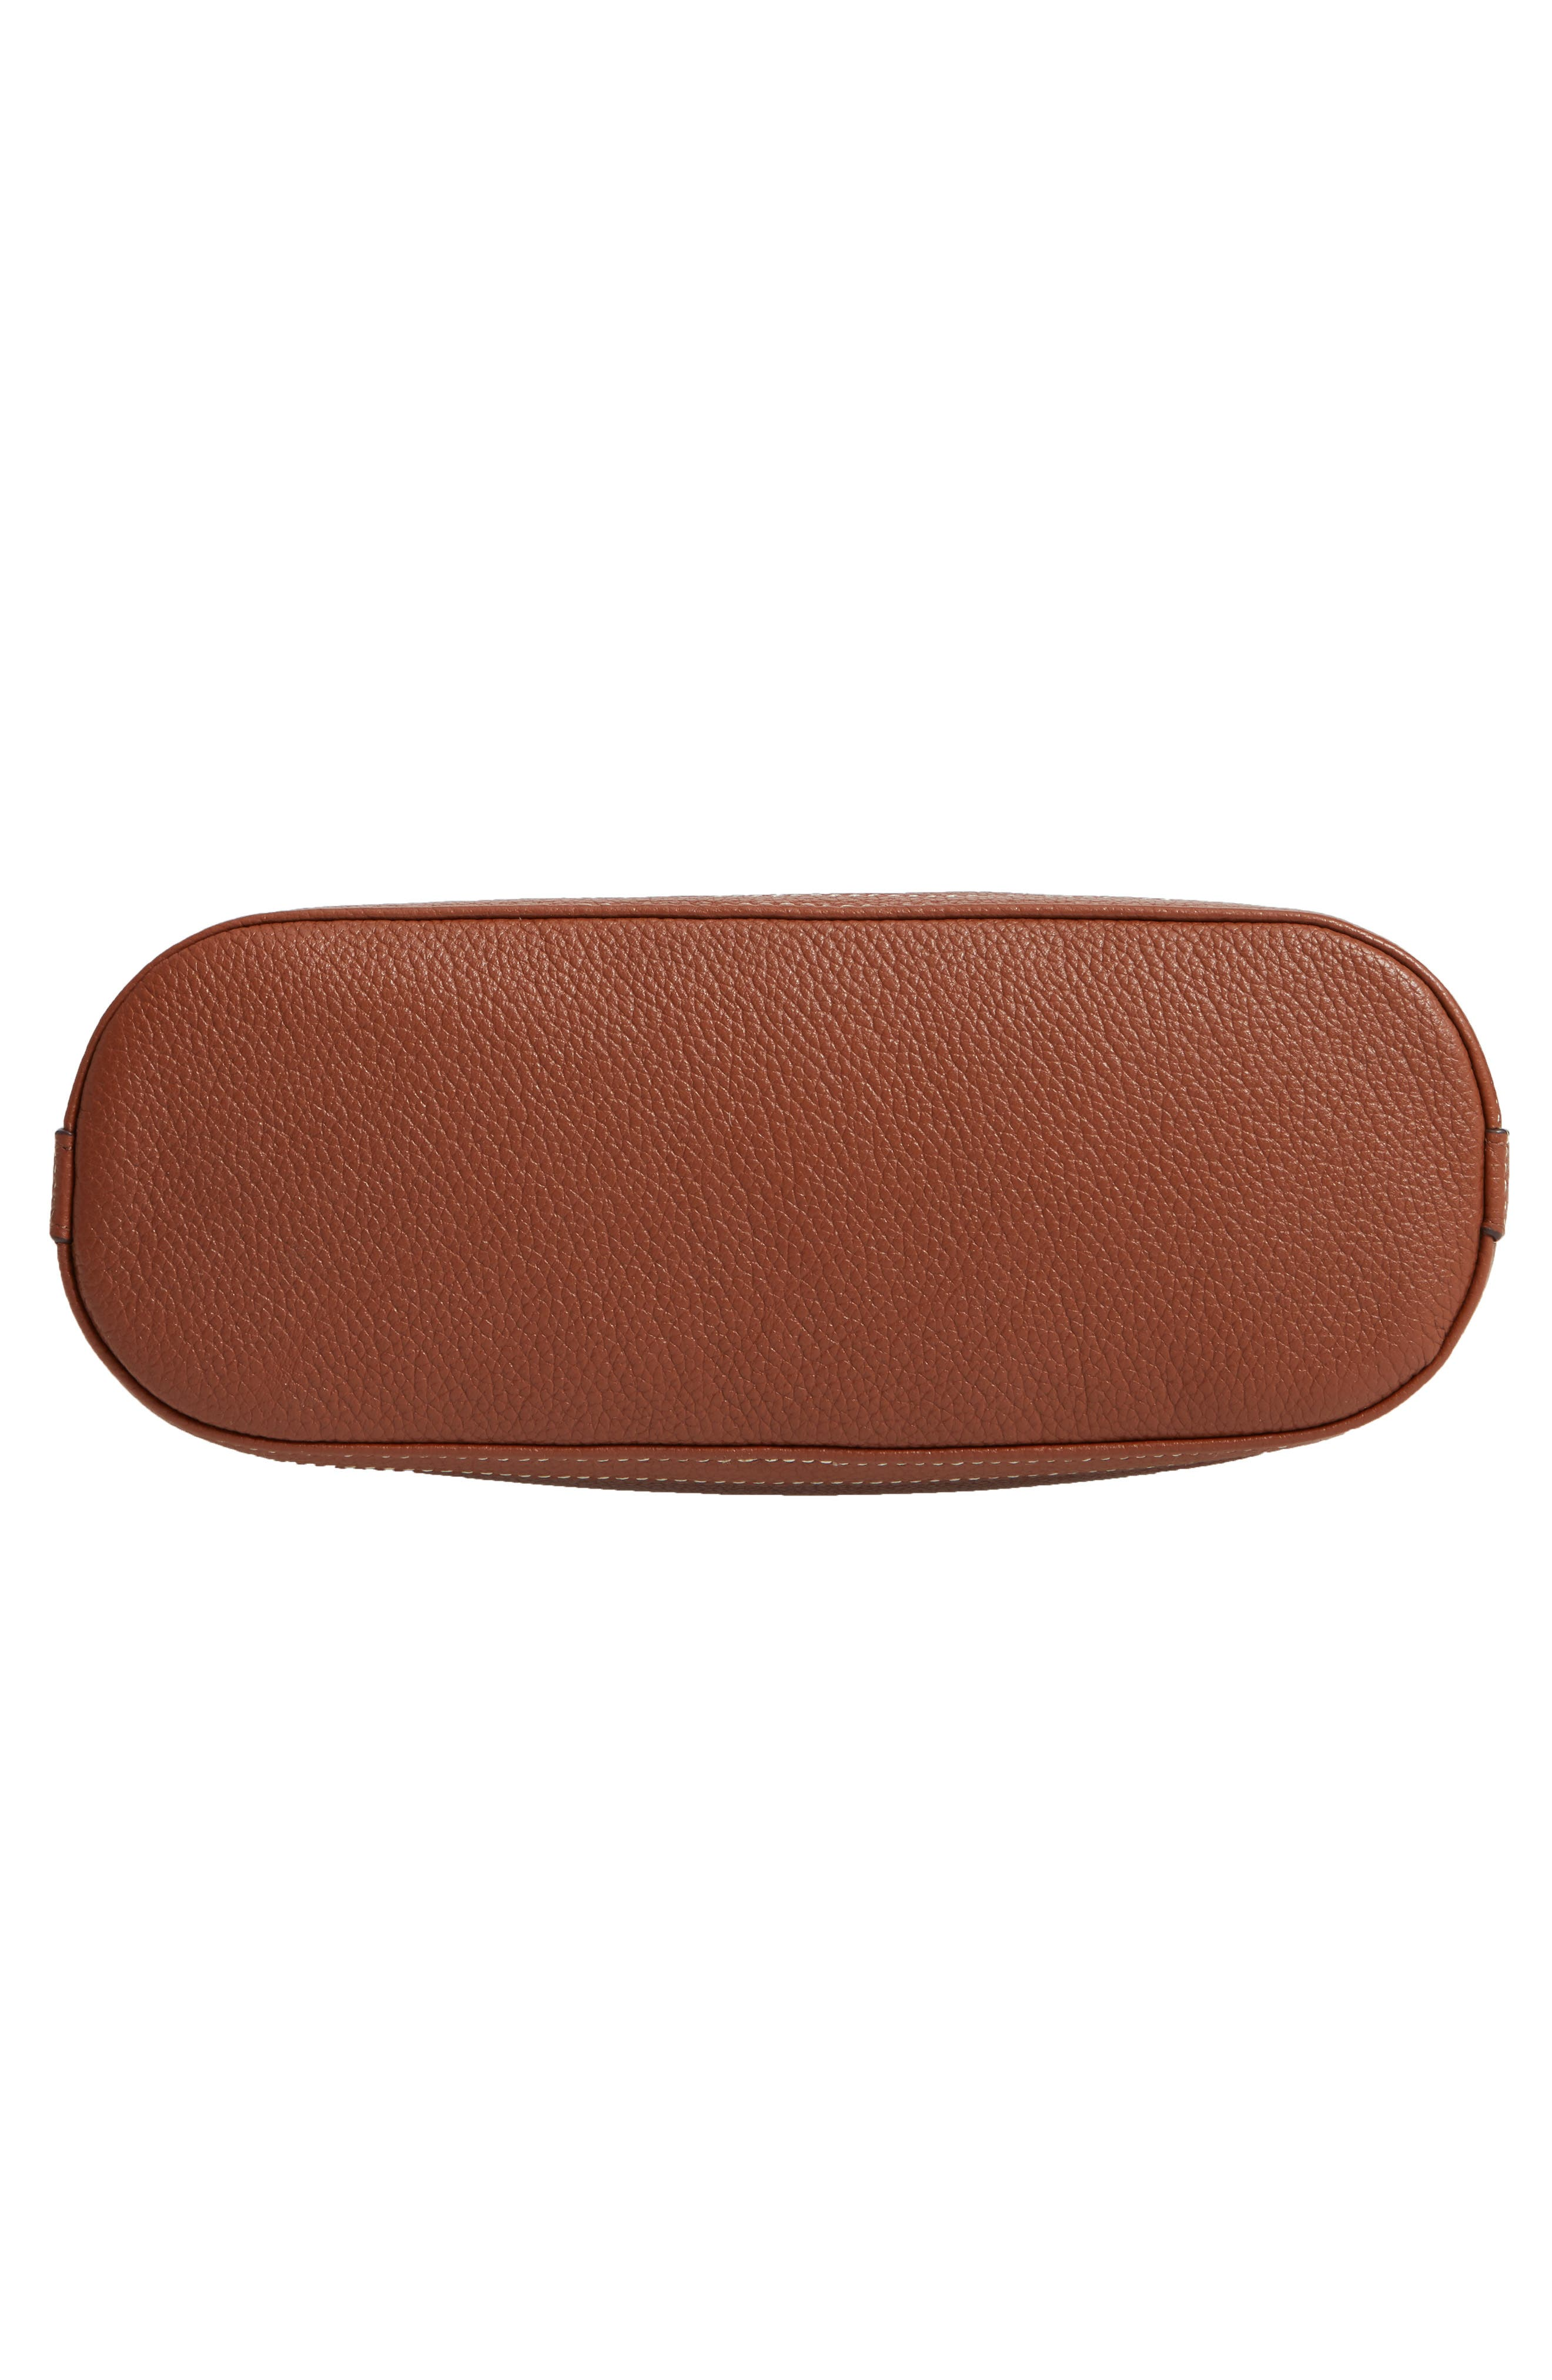 NORDSTROM,                             Maribel Leather Crossbody Bag,                             Alternate thumbnail 6, color,                             BROWN AZTEC